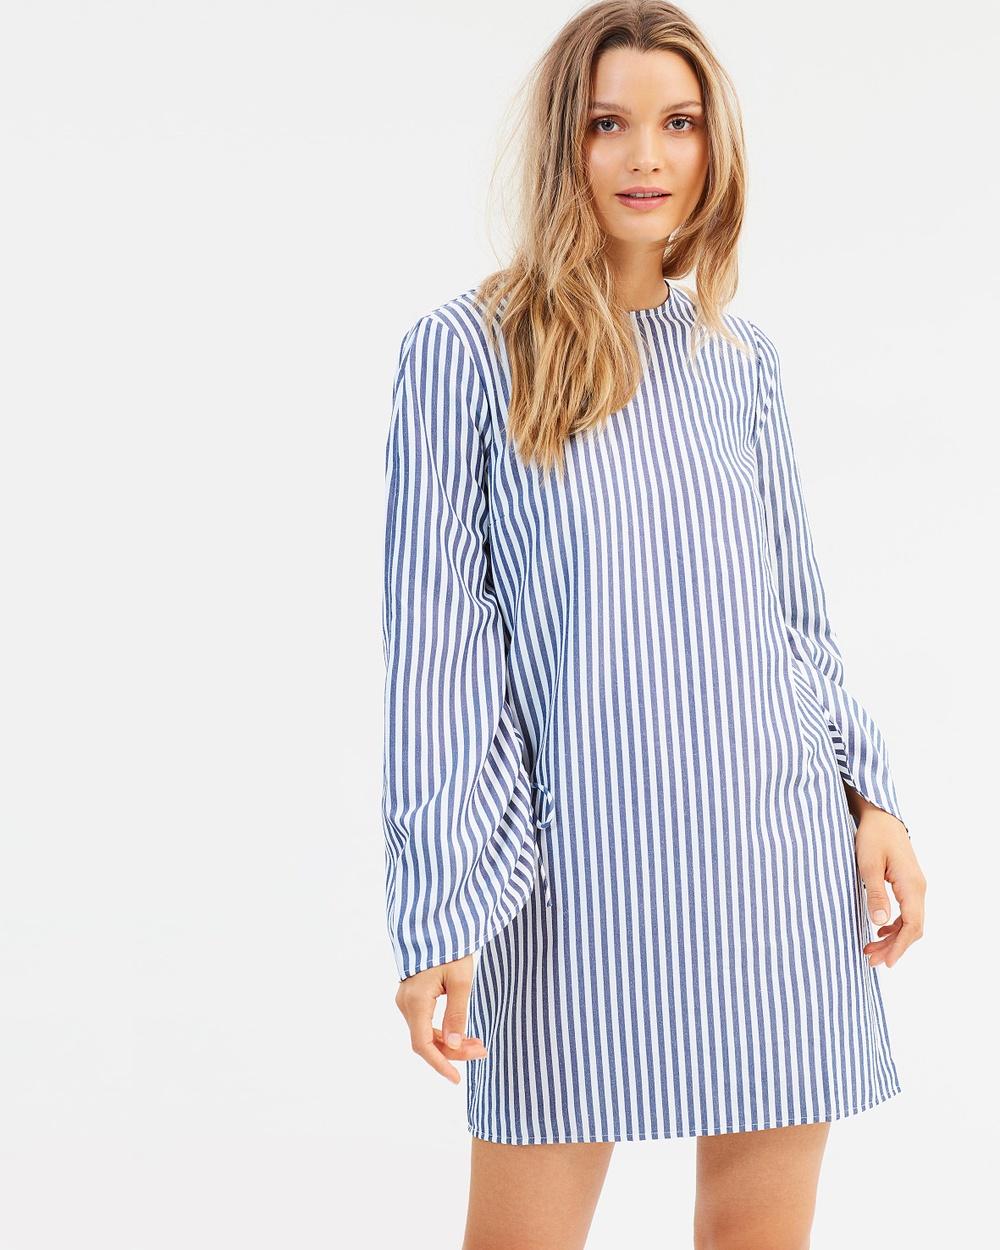 Cooper St Striped Swan Shift Dress Dresses Stripe Striped Swan Shift Dress